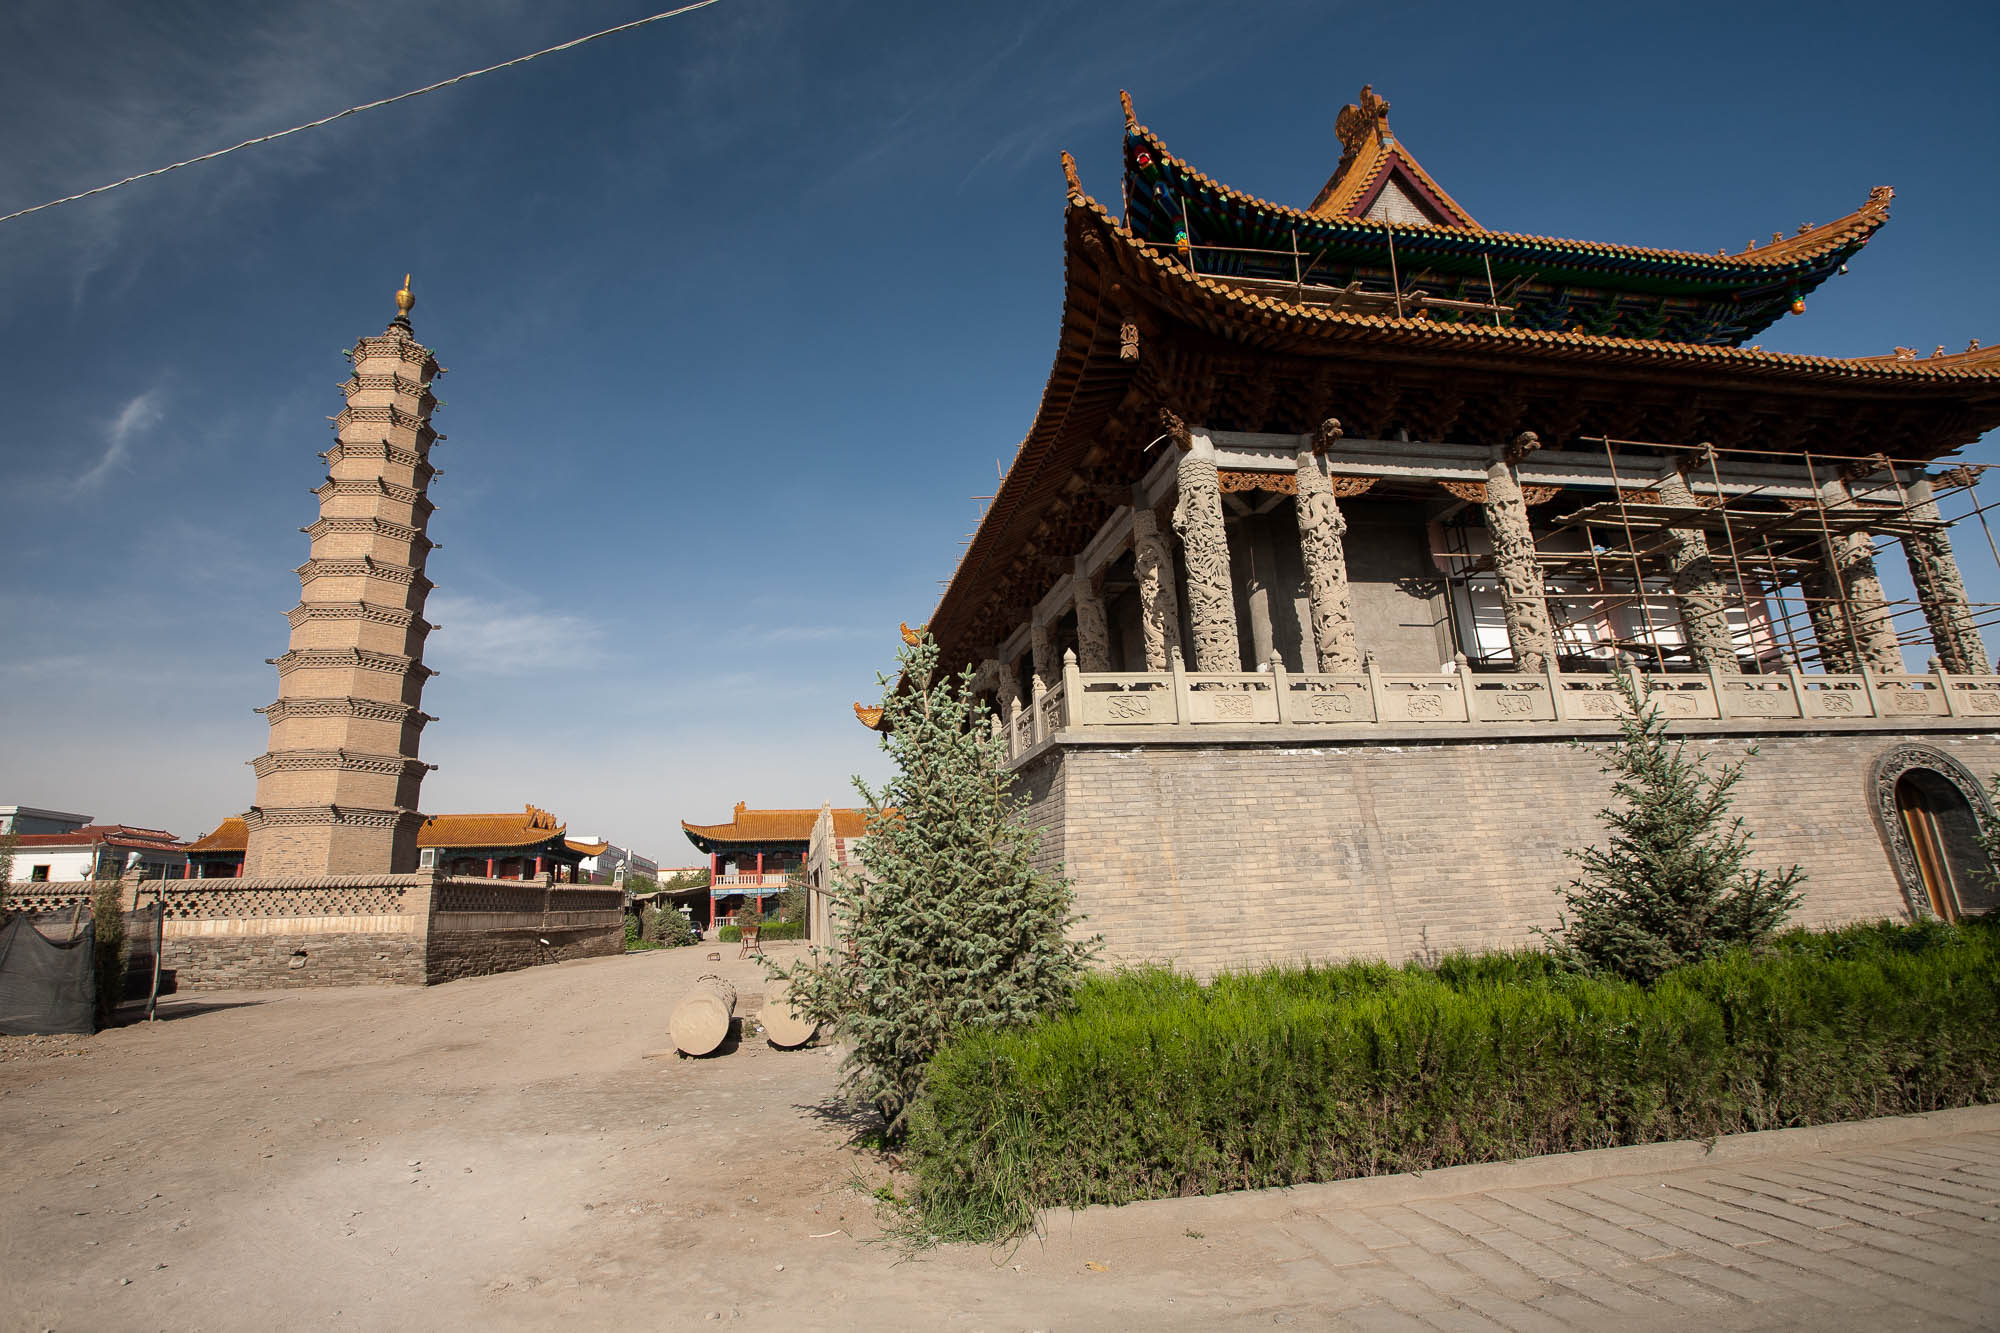 Luoshi Temple